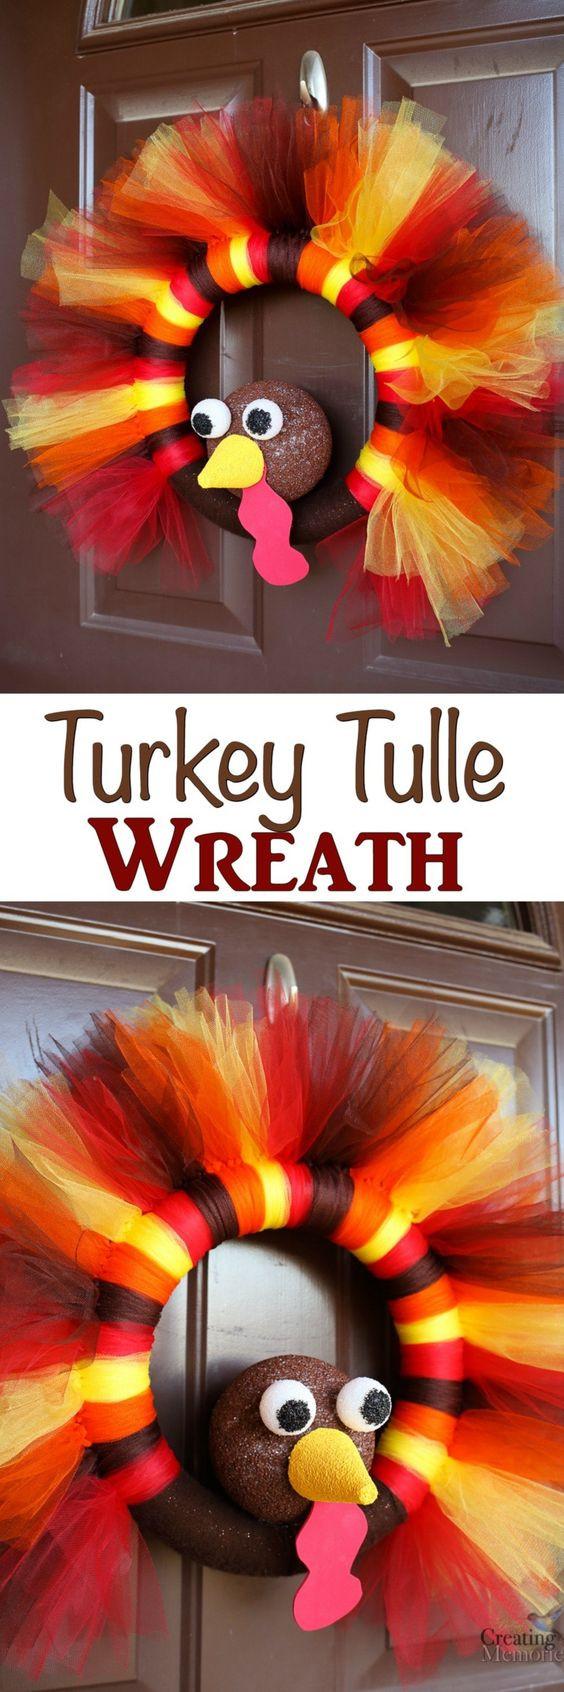 Turkey Decorations For Thanksgiving  30 Easy DIY Thanksgiving Door Decorations 2017